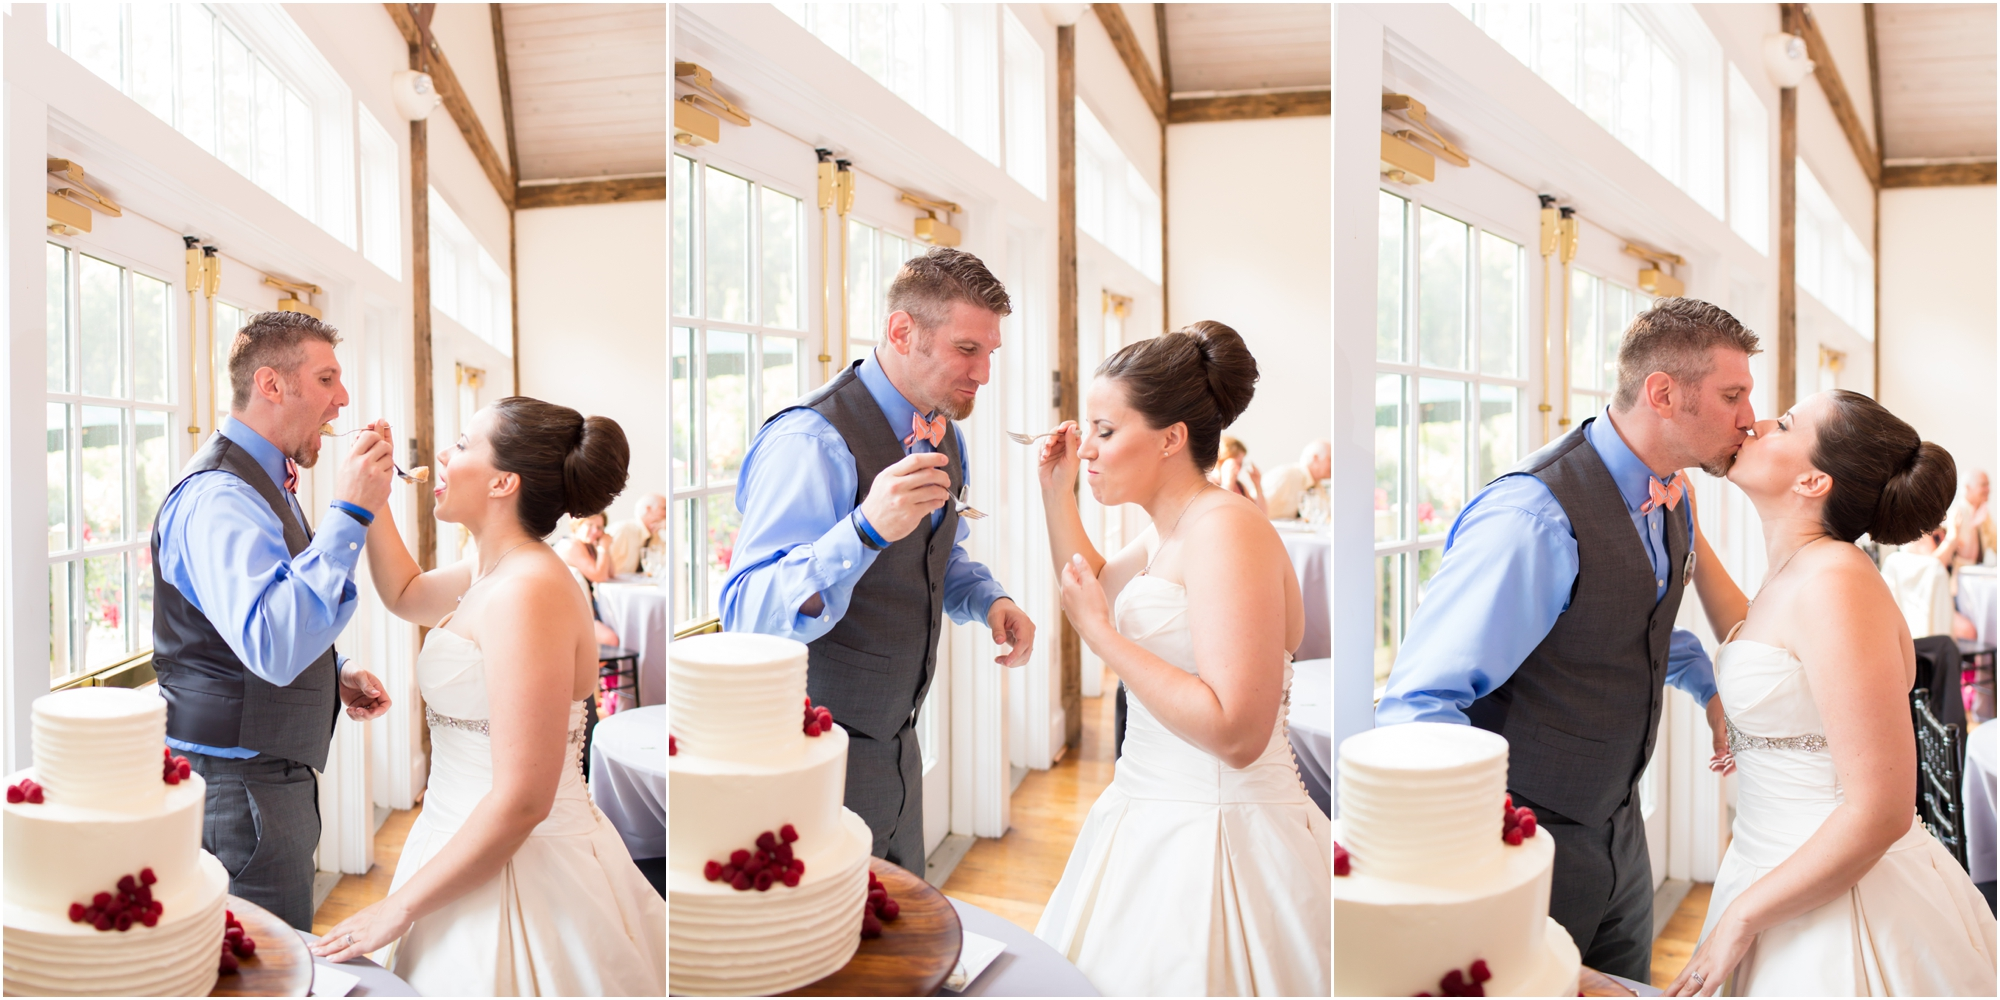 6-Berkstresser Wedding Reception-672_anna grace photography pennsylvania wedding photographer riverdale manor.jpg